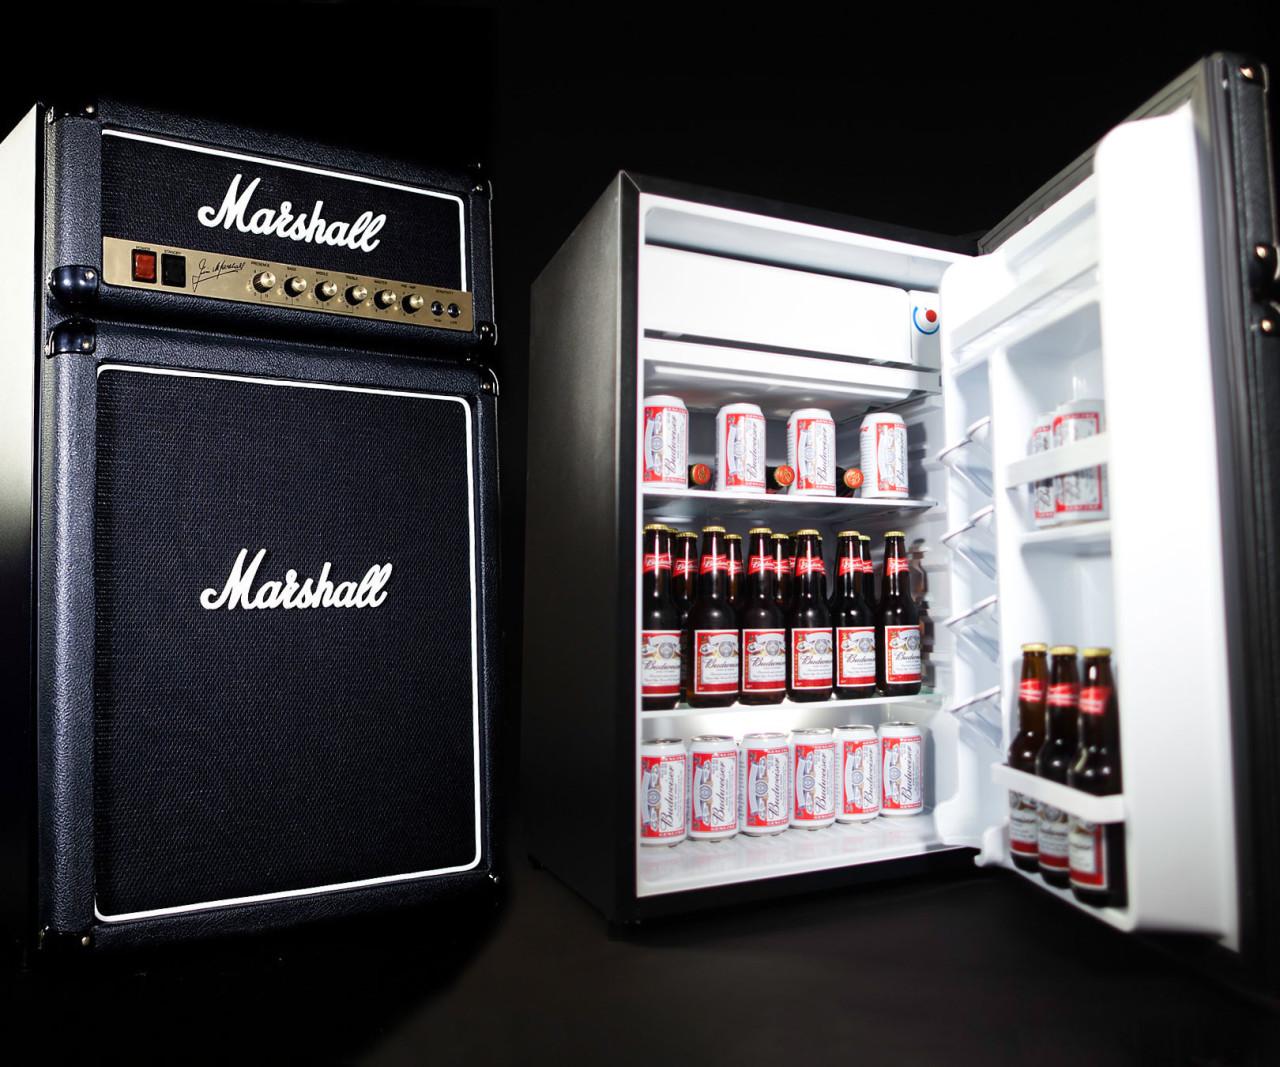 man cave beer fridge